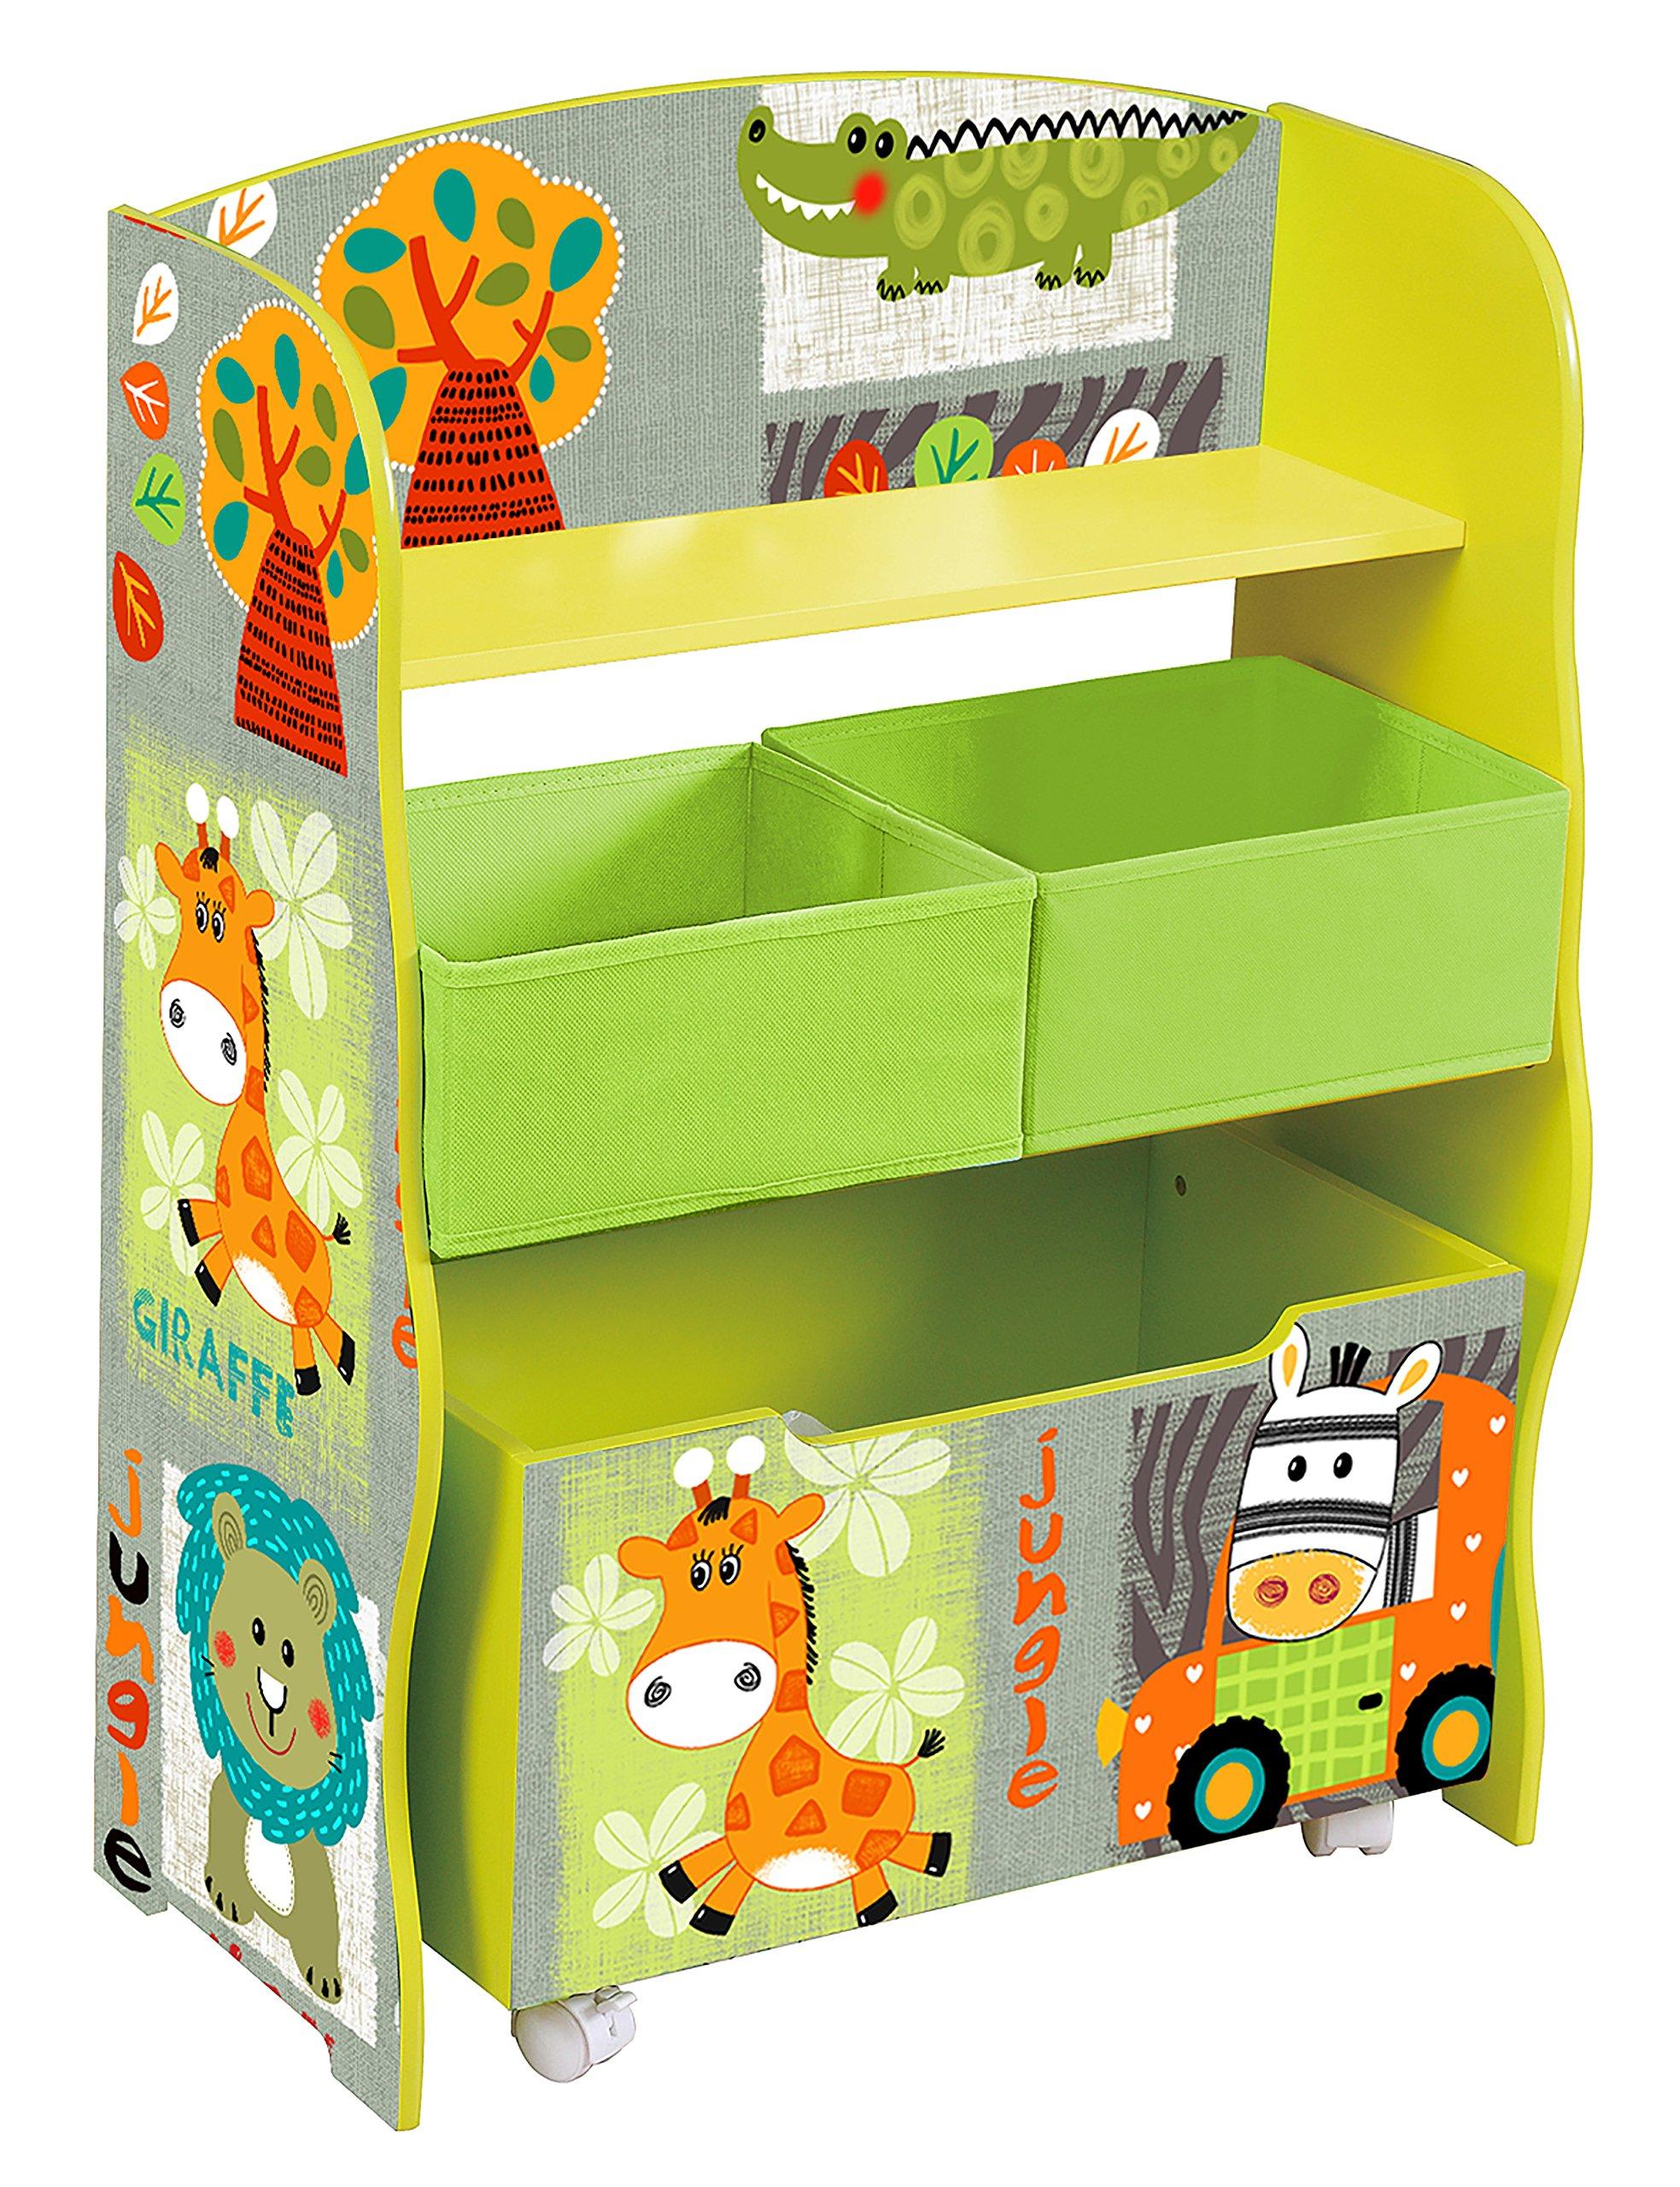 Liberty House Toys TF4821 Storage Fabric Bins Unit, Green, Orange, Black, White, Brown, Blue